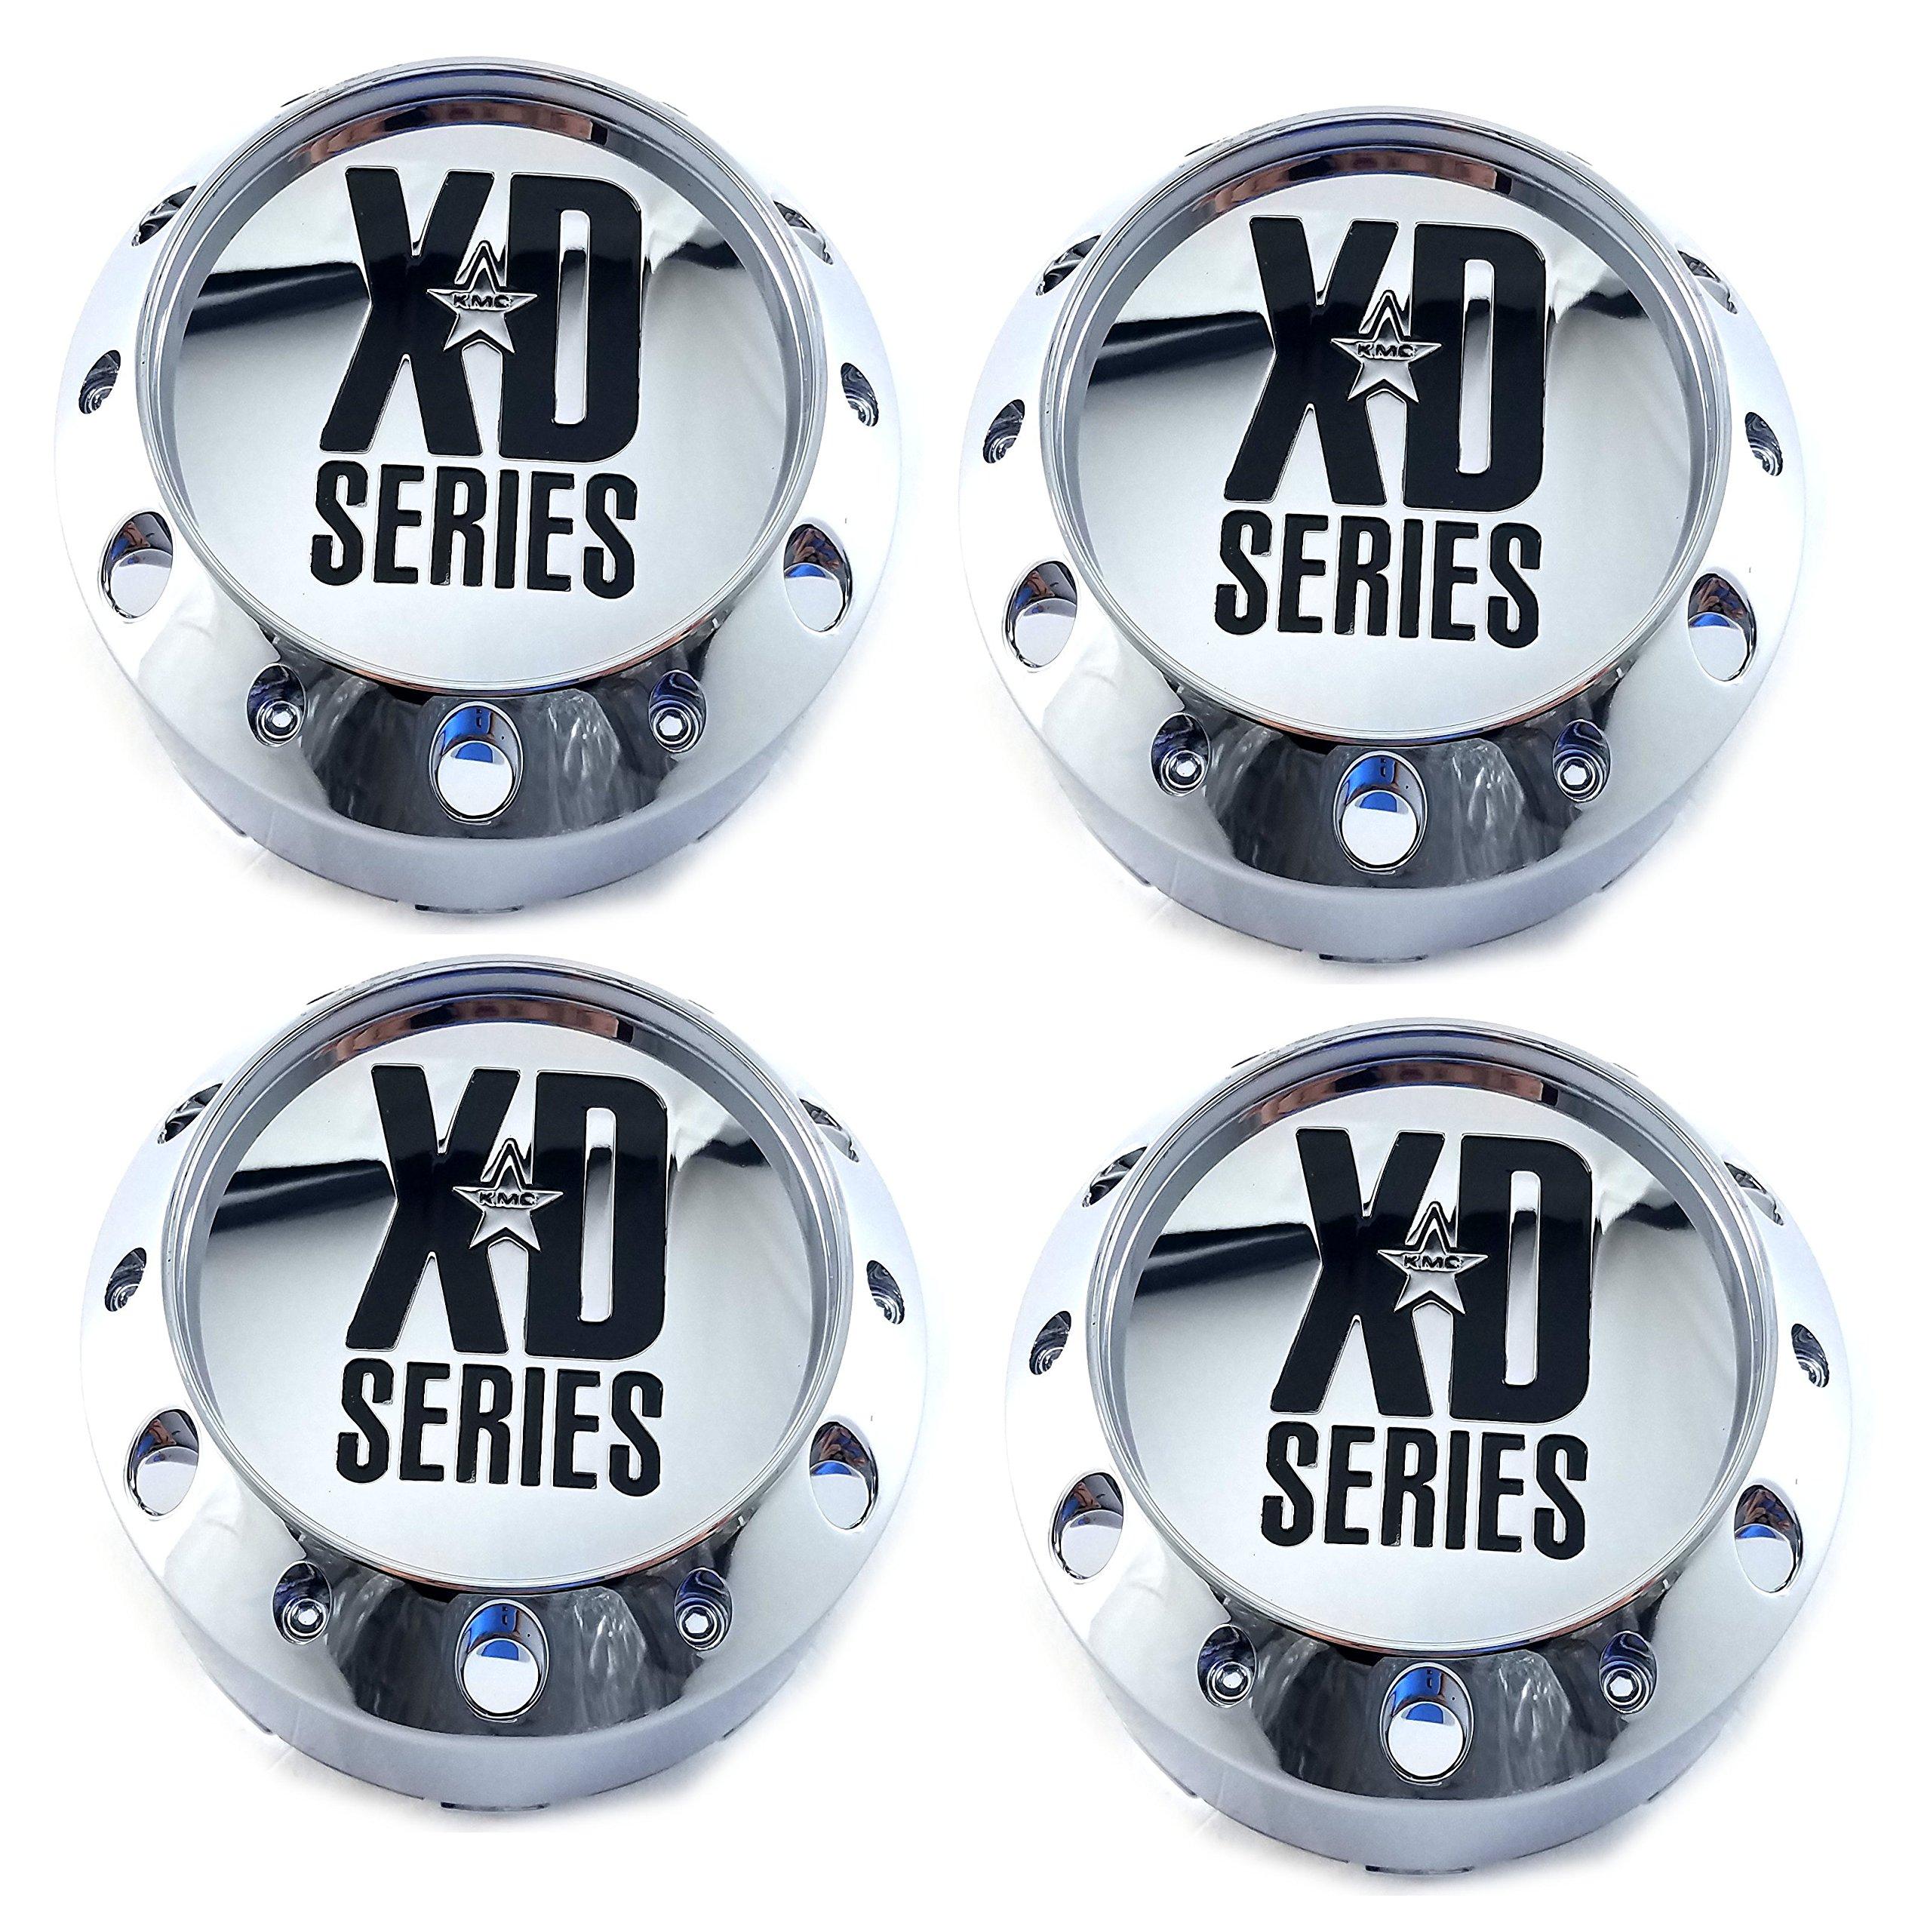 KMC-XD-Series-Set-4pcs-XD-Series-Chrome-Center-Cap-464K106-Snap-in-KMC-XD779-XD786-XD795